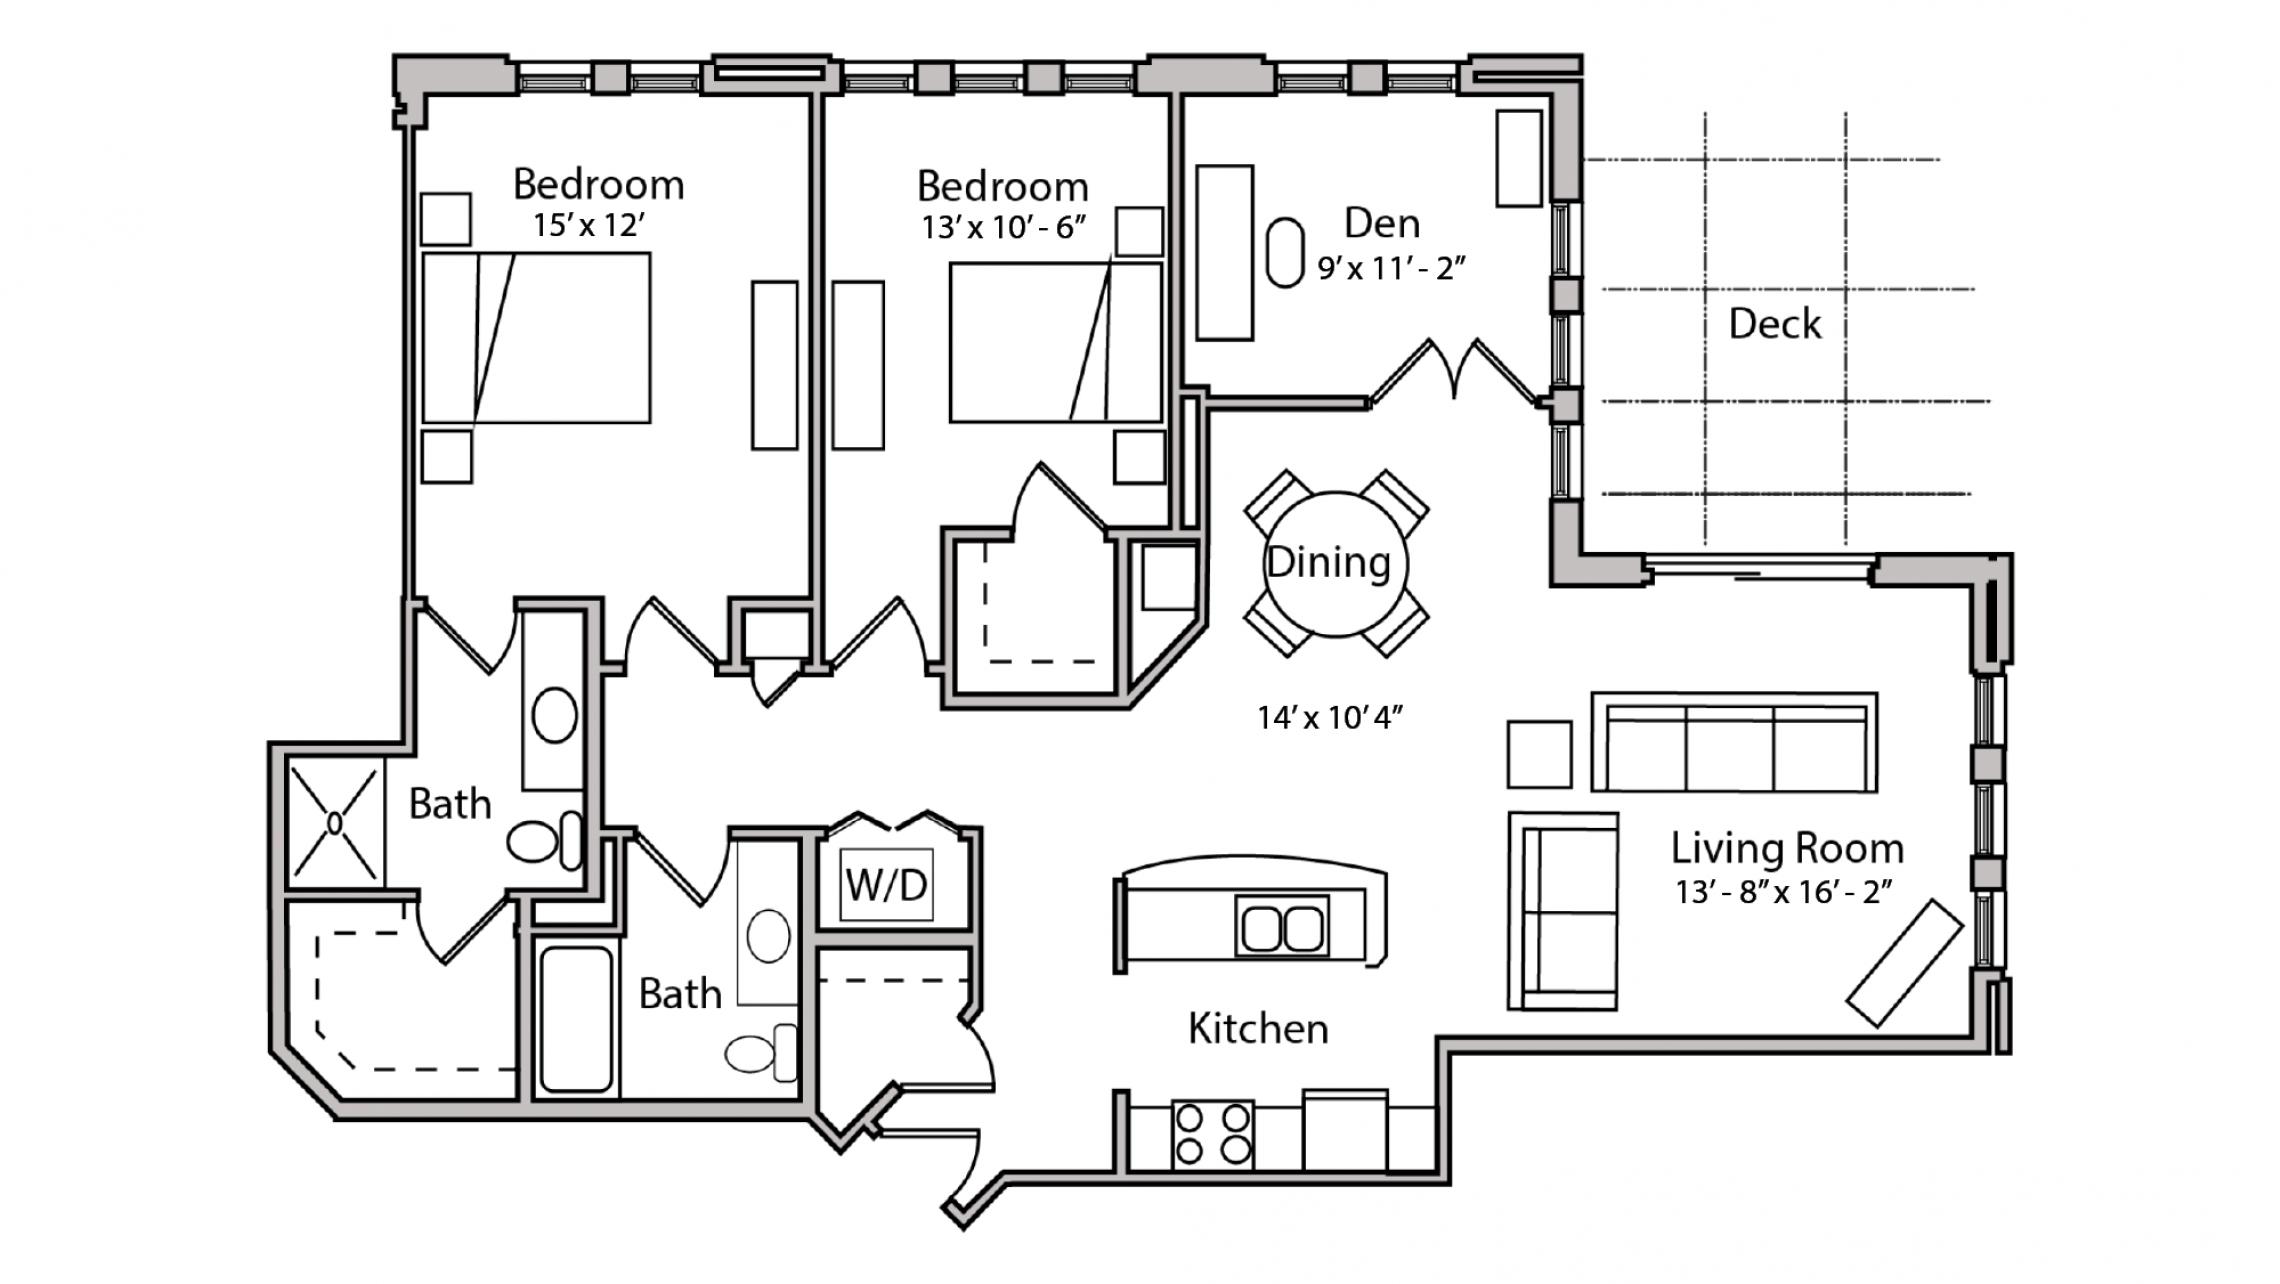 ULI The Depot 1-505 - Two Bedroom Plus Den, Two Bathroom